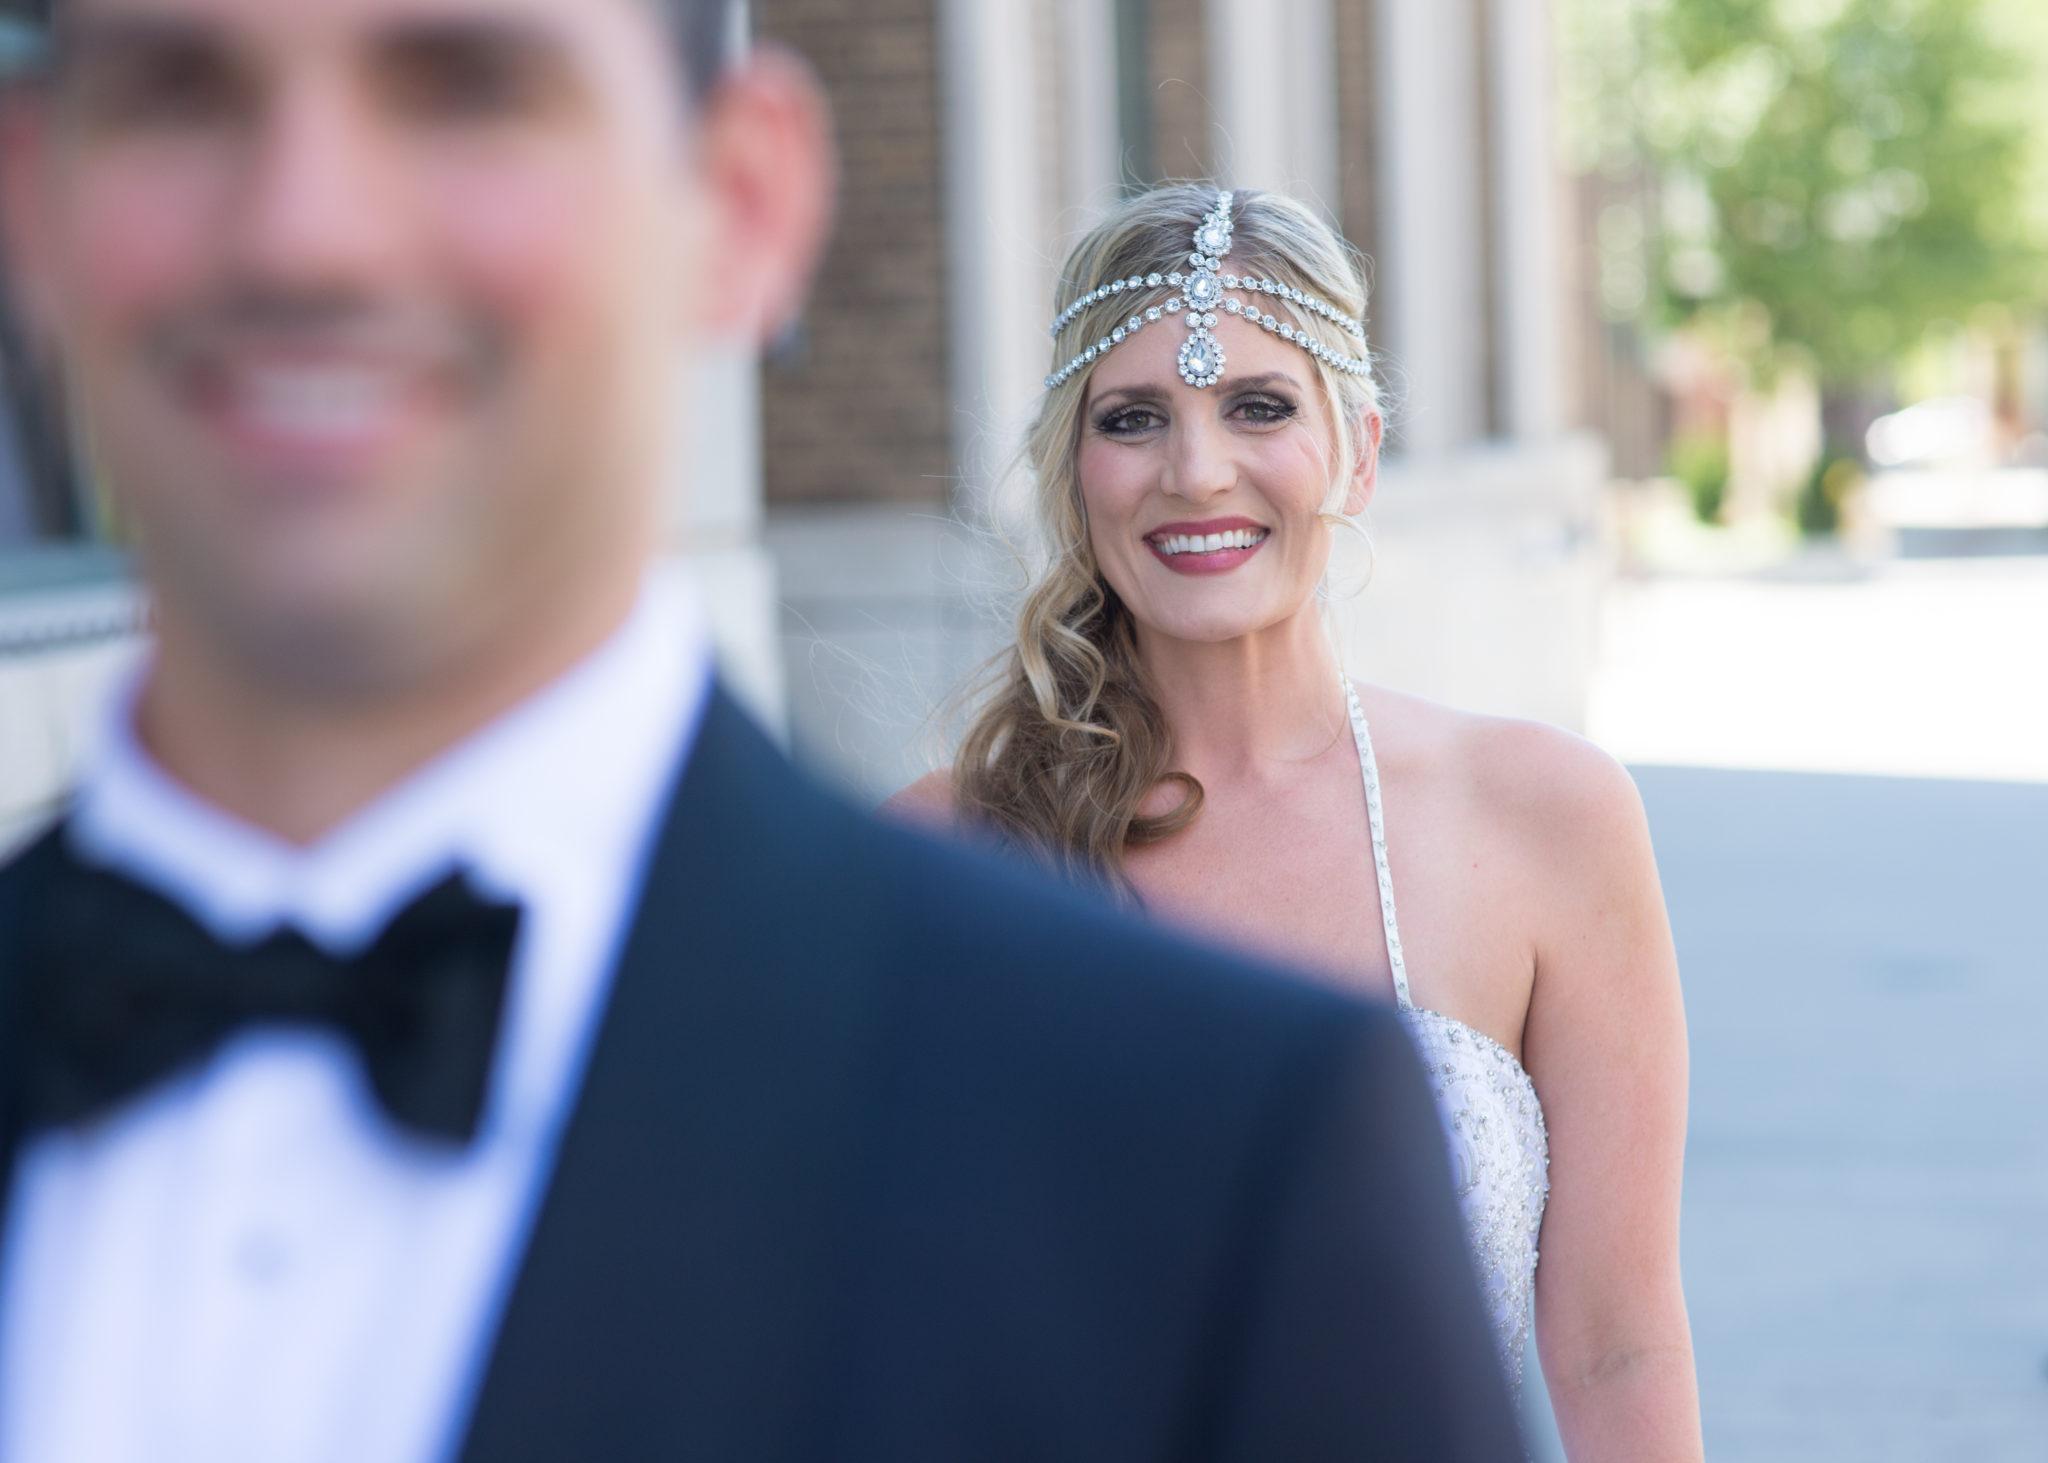 engage ment photo shoot Ryan hender wedding photography